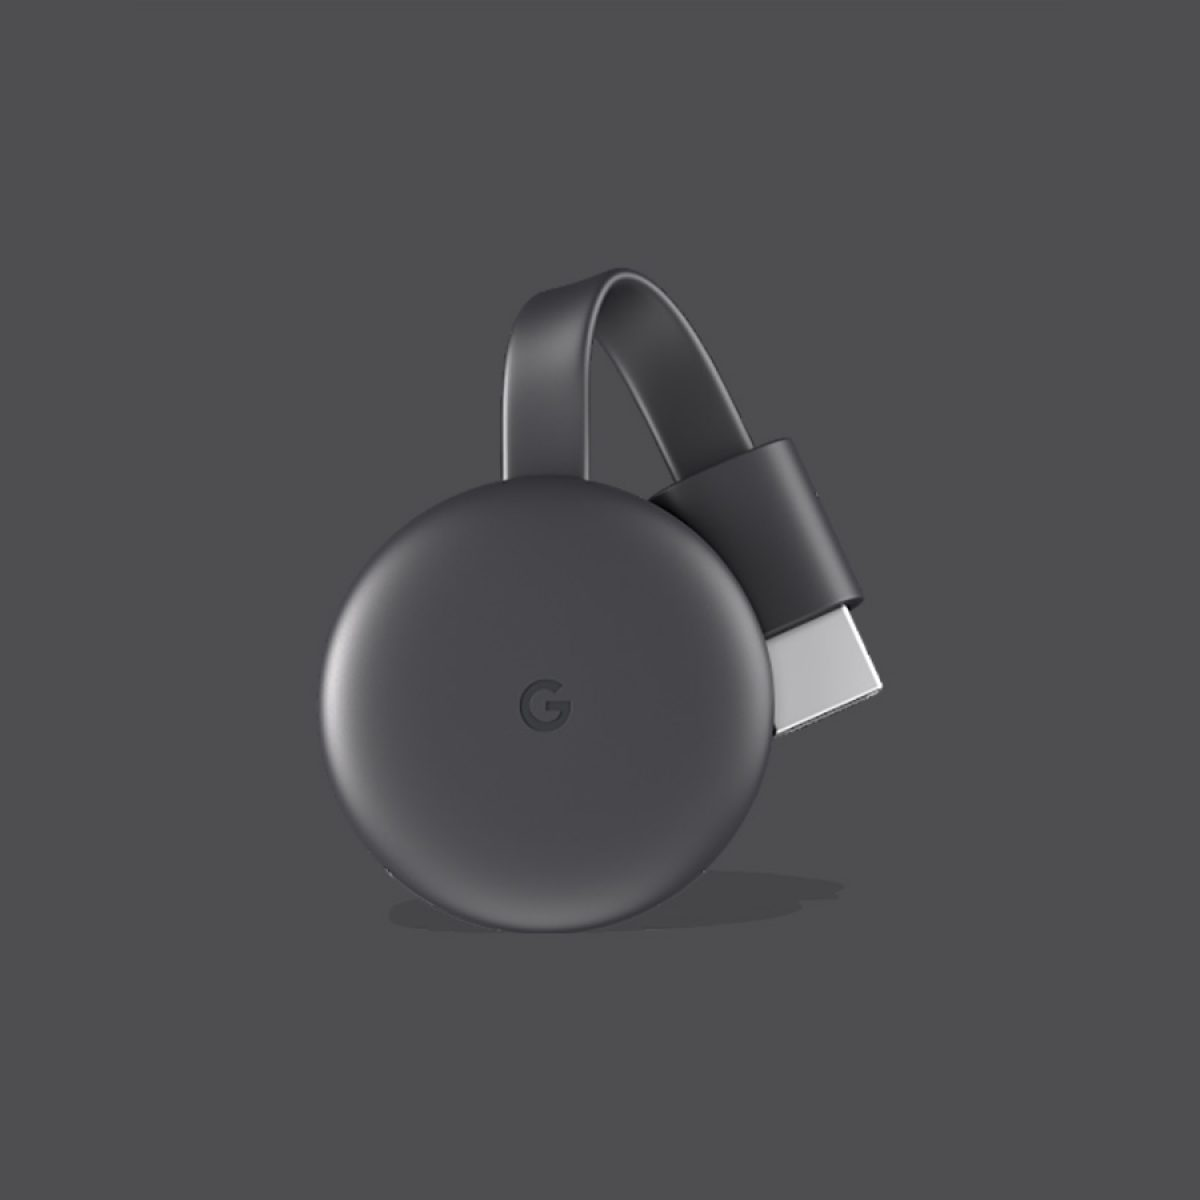 Chromecast Drops To 19 For Black Friday